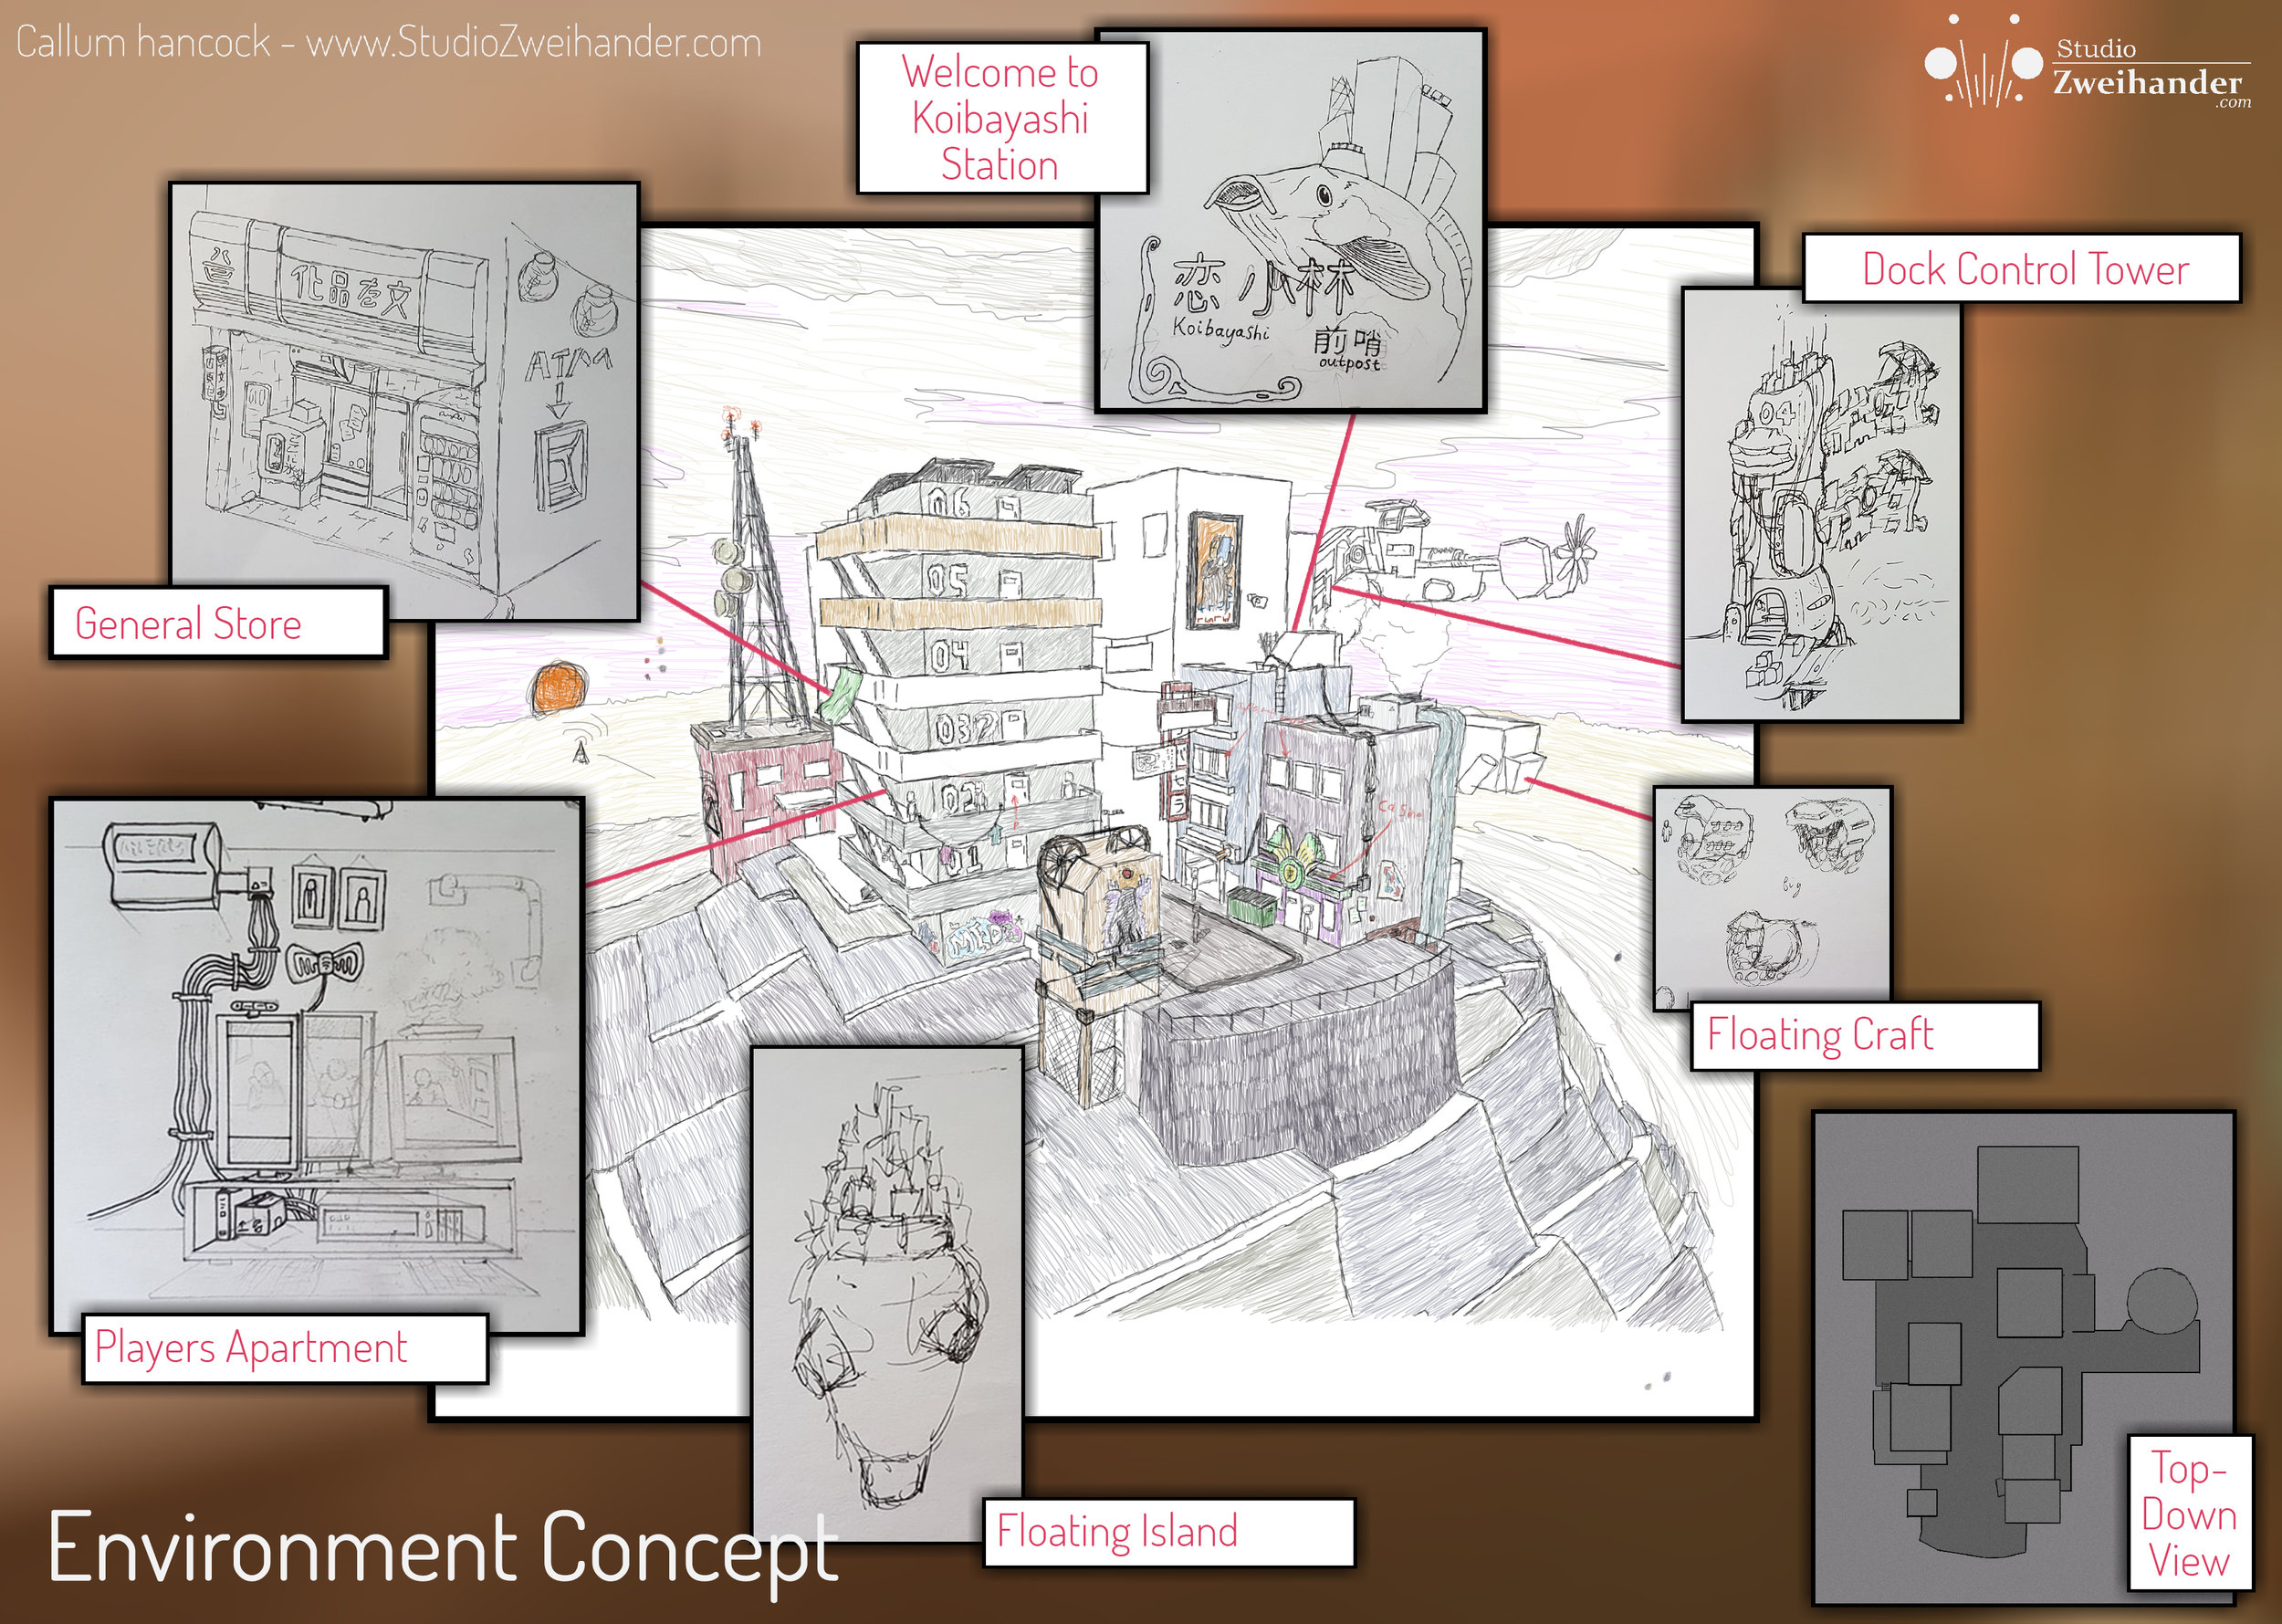 Environment ConceptWDNDWOAIN.jpg